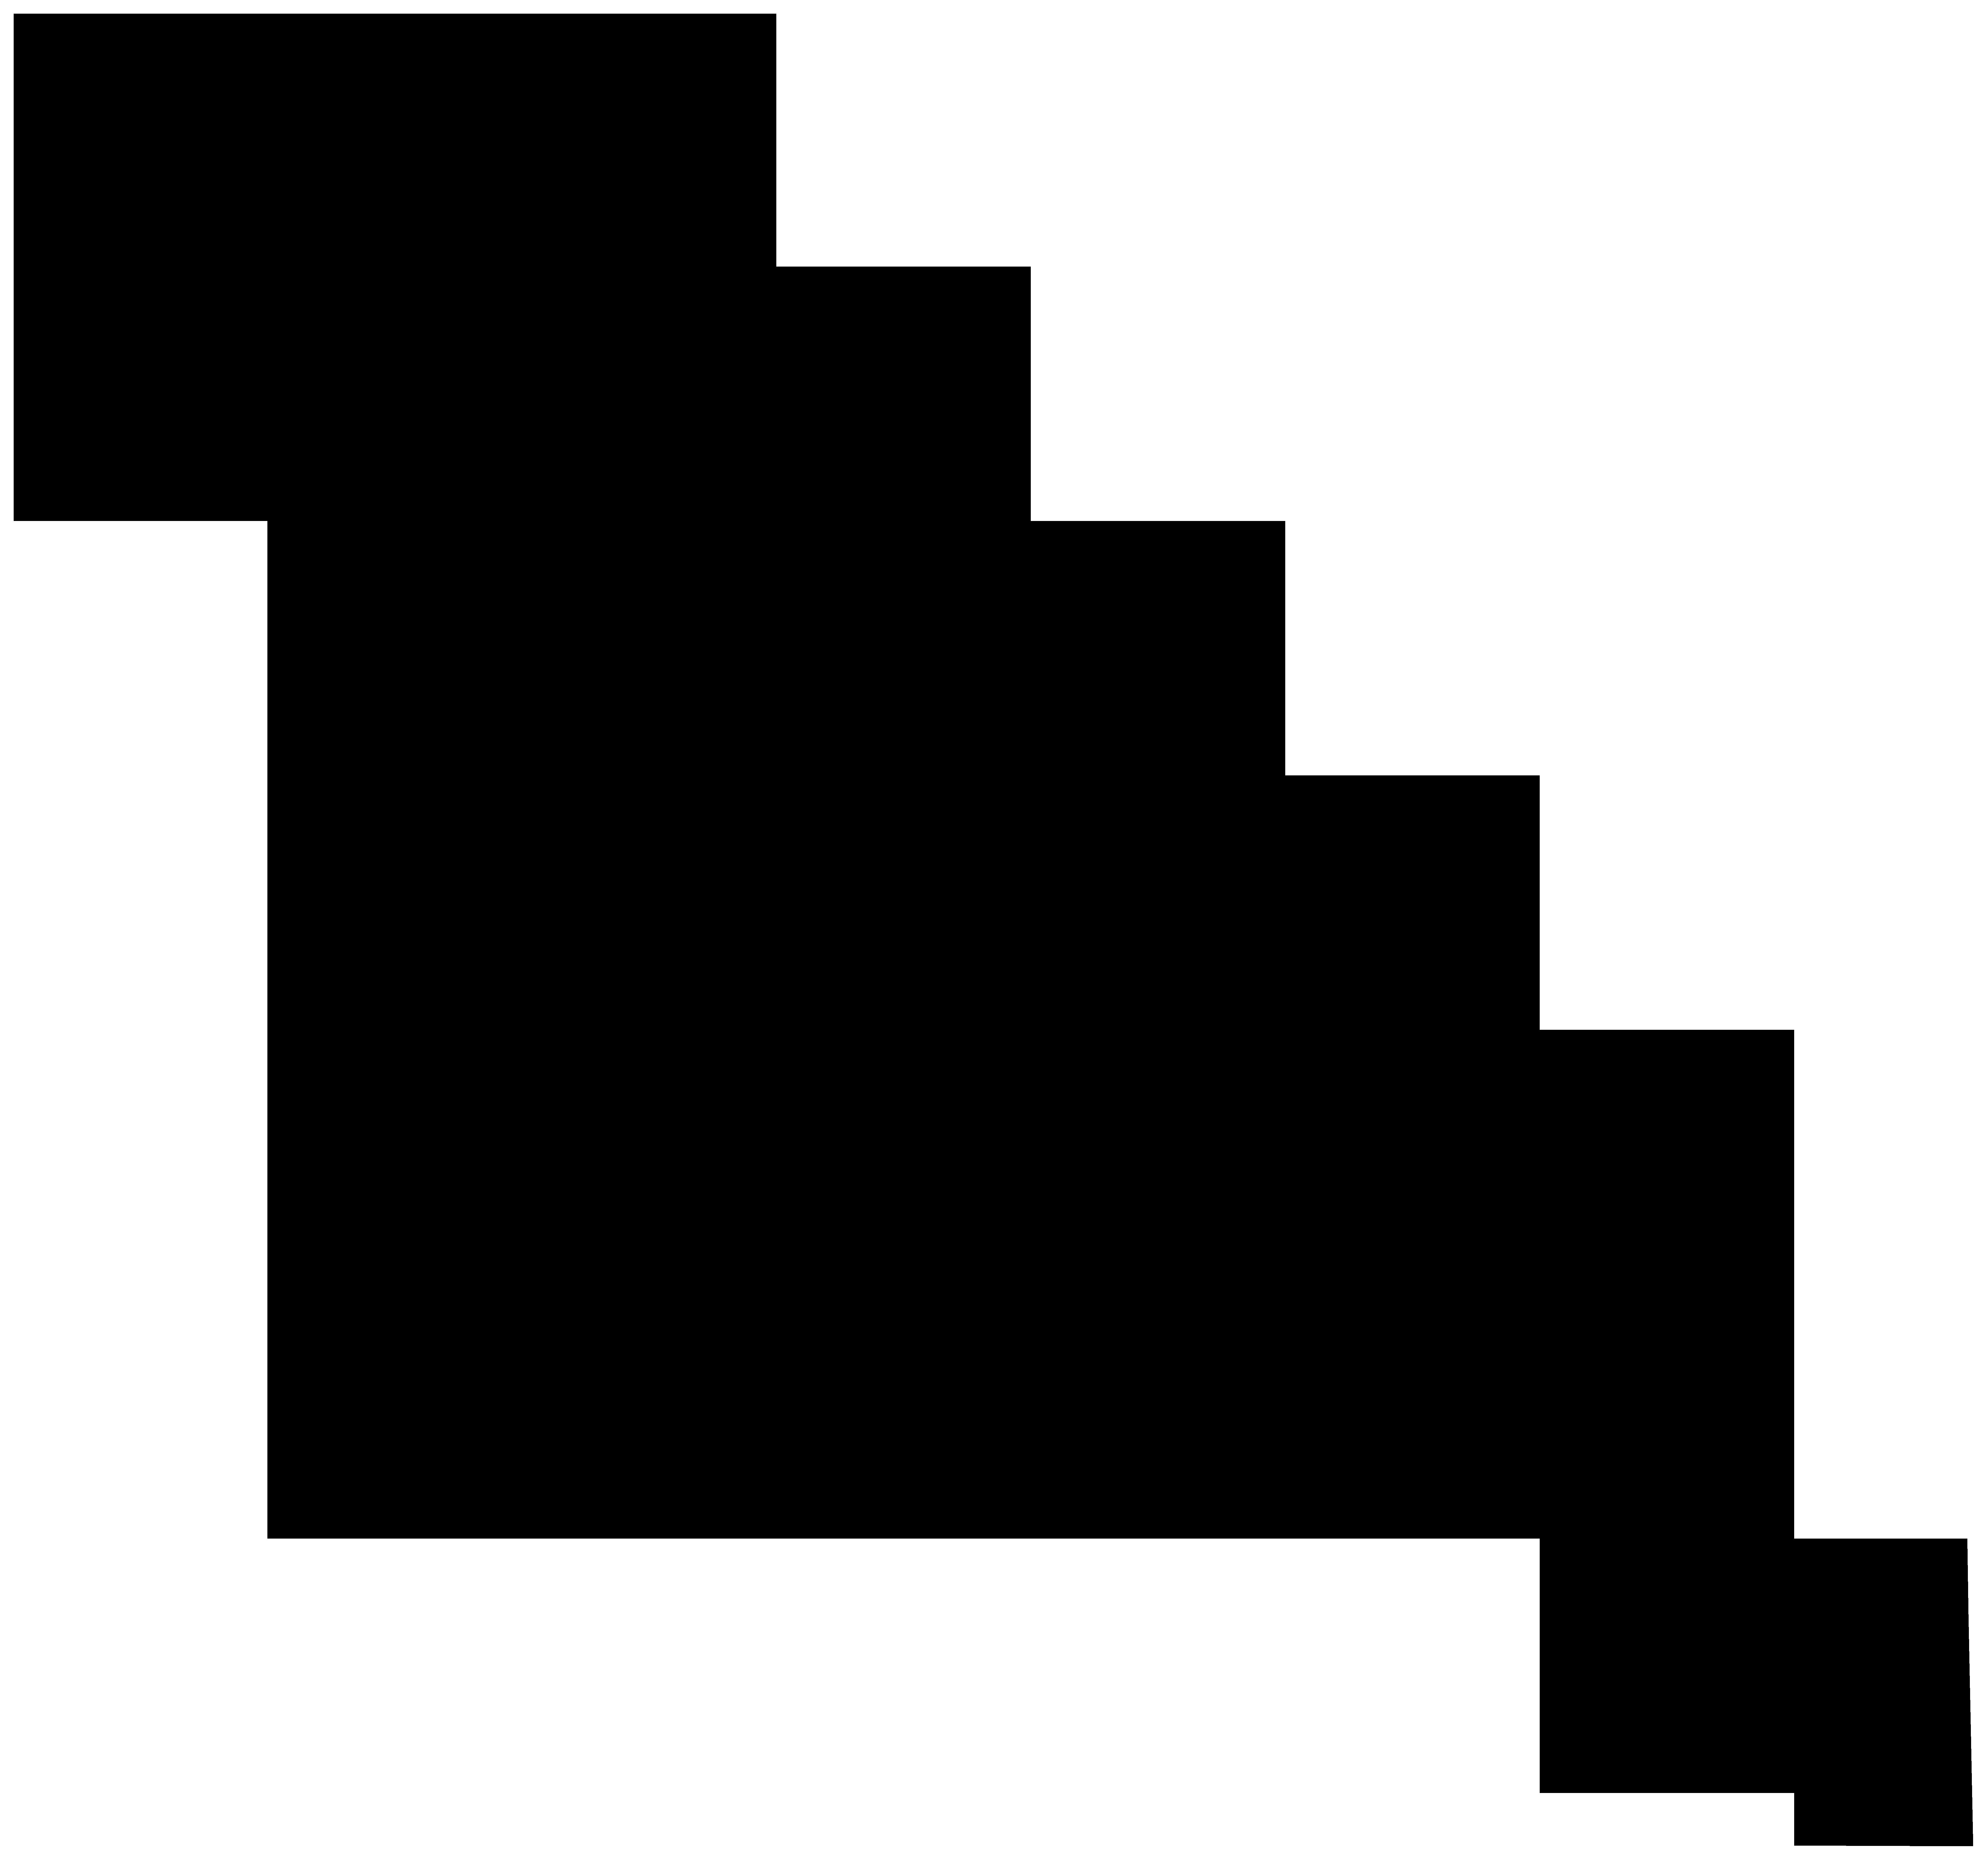 8000x7527 Parrot Png Silhouette Clip Art Imageu200b Gallery Yopriceville